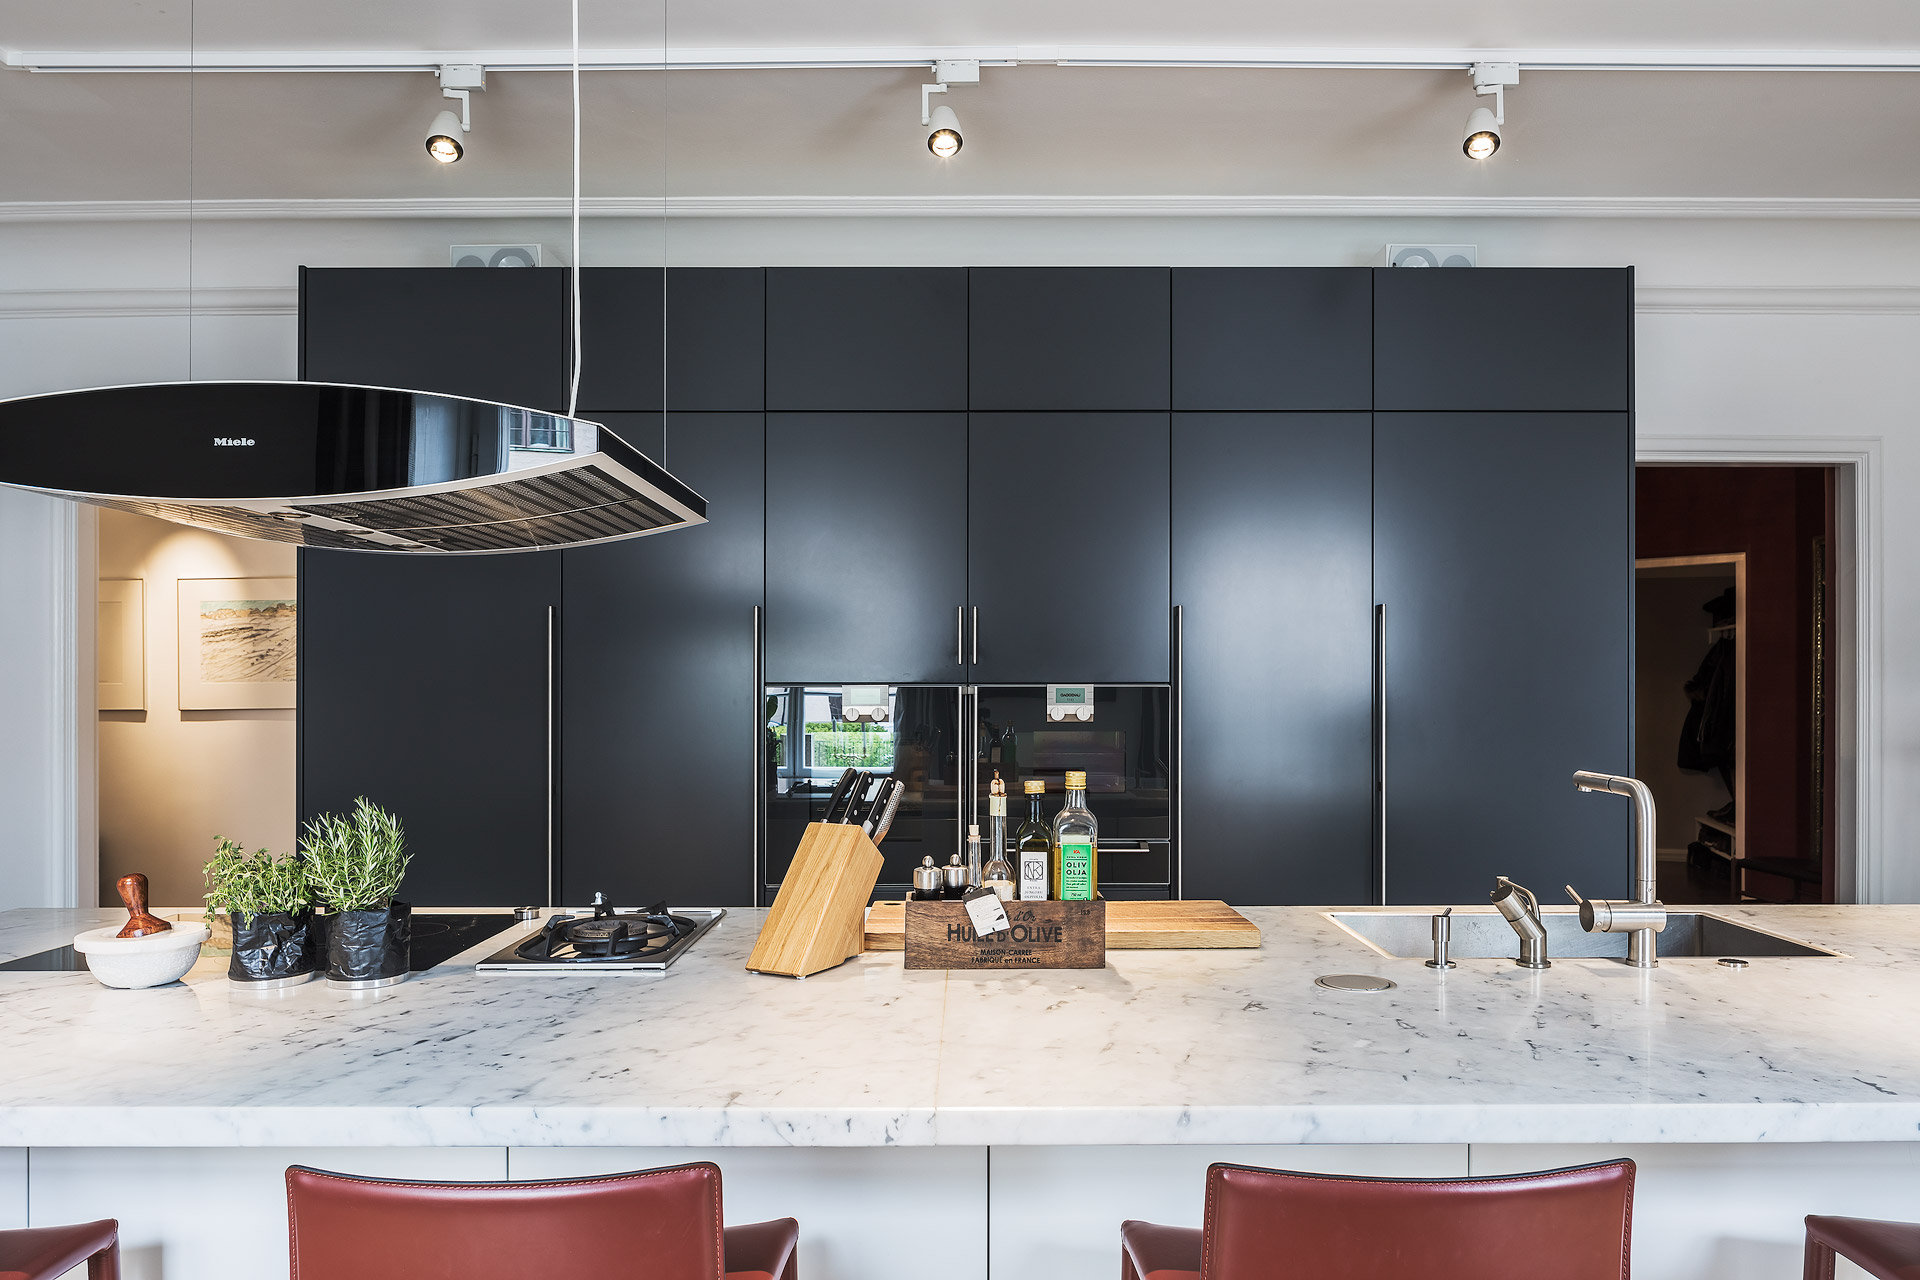 кухня темные фасады шкафы столешница мрамор плита вытяжка барные стулья